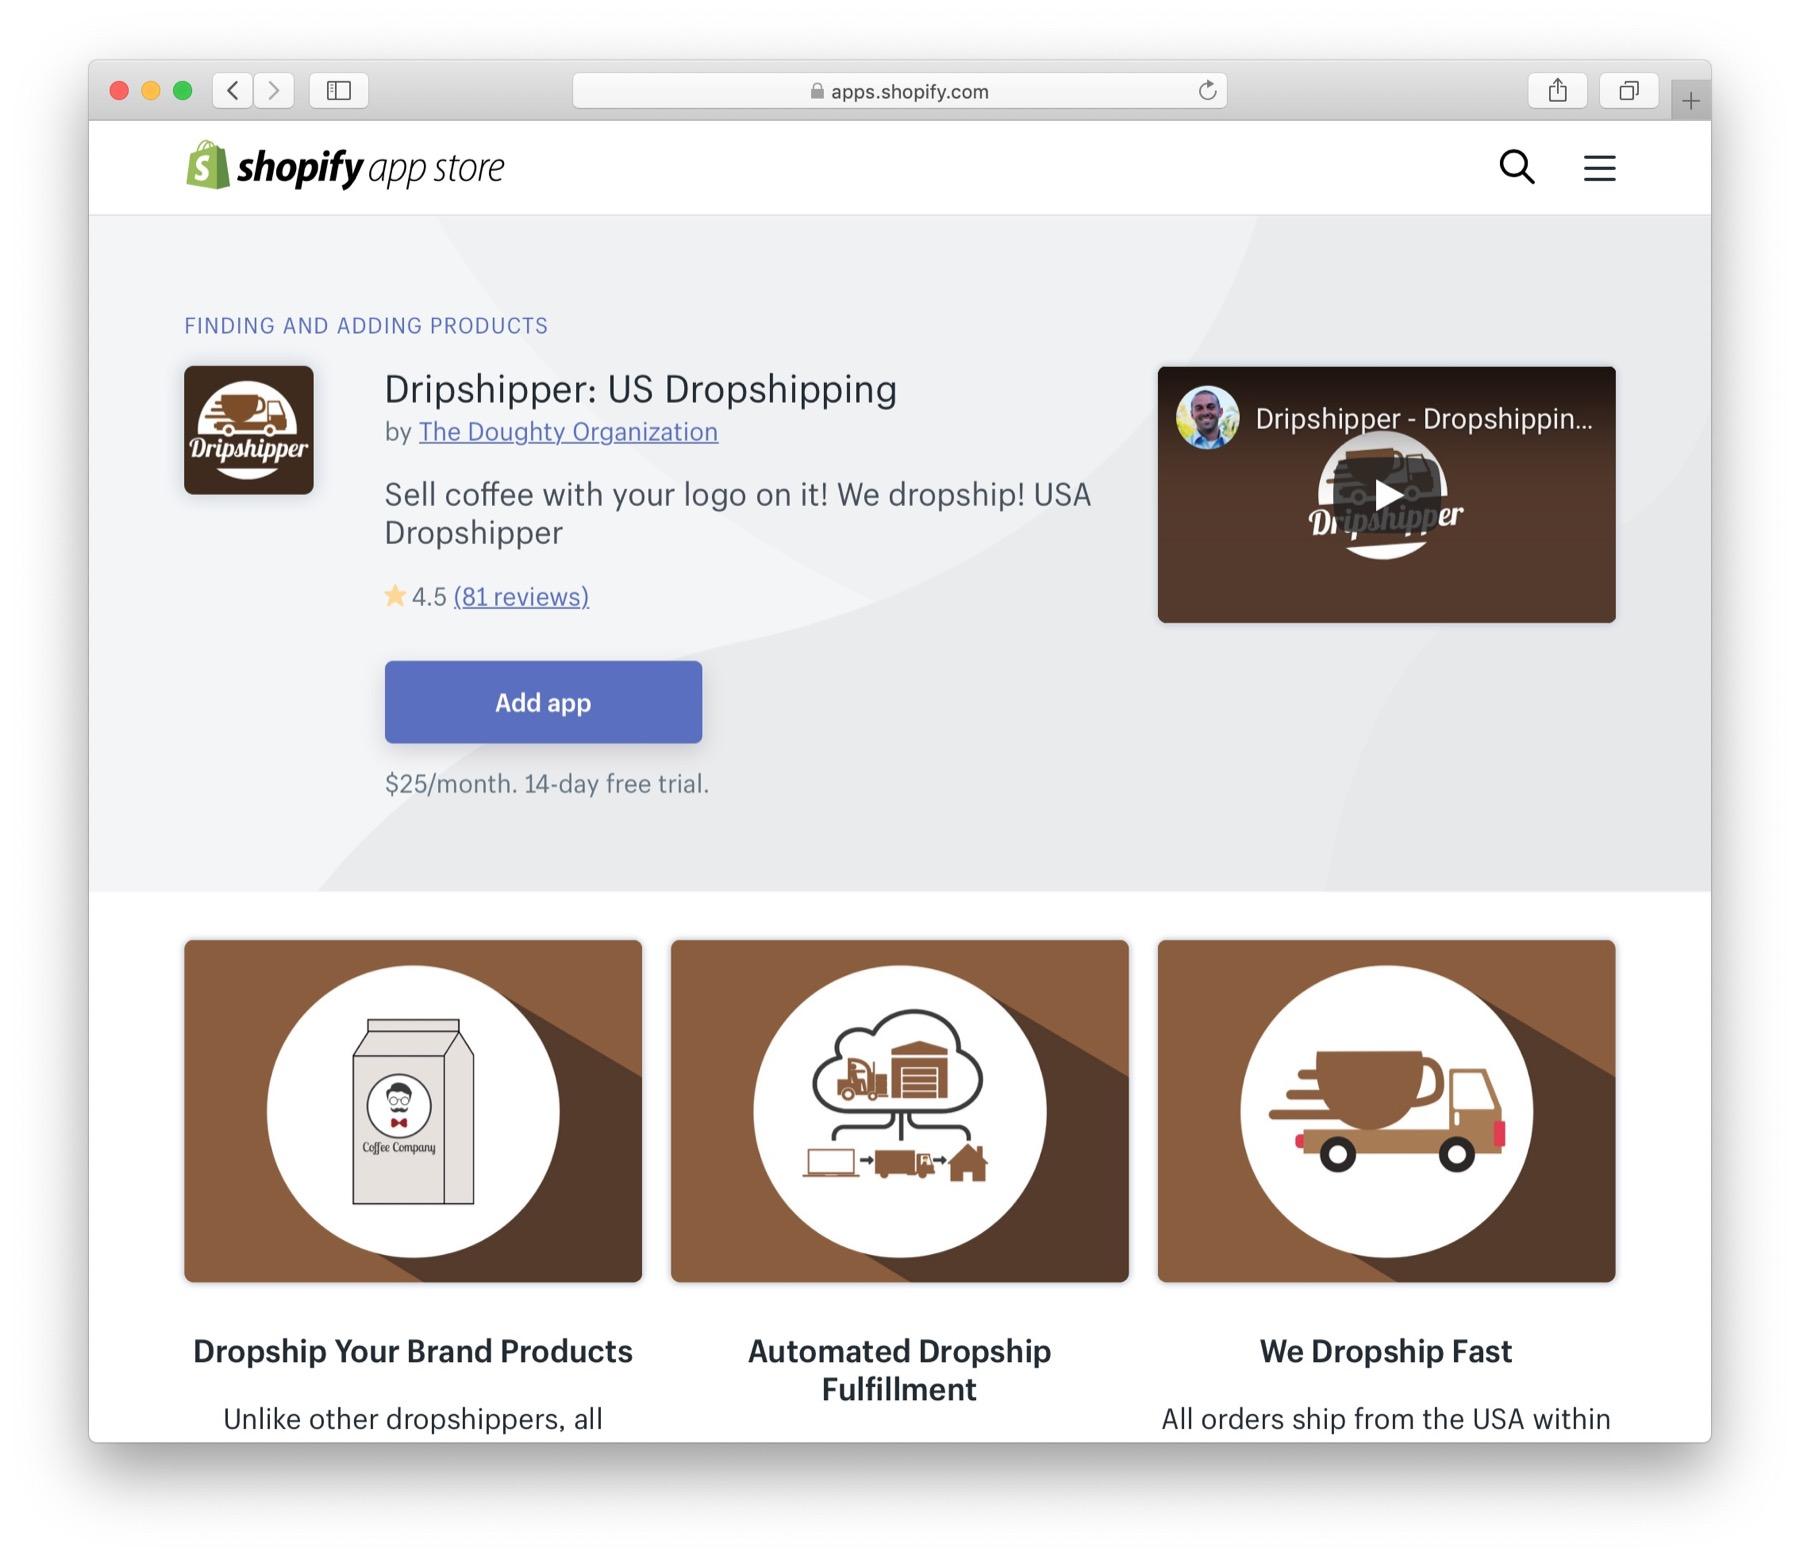 Dripshipper dropshipping app